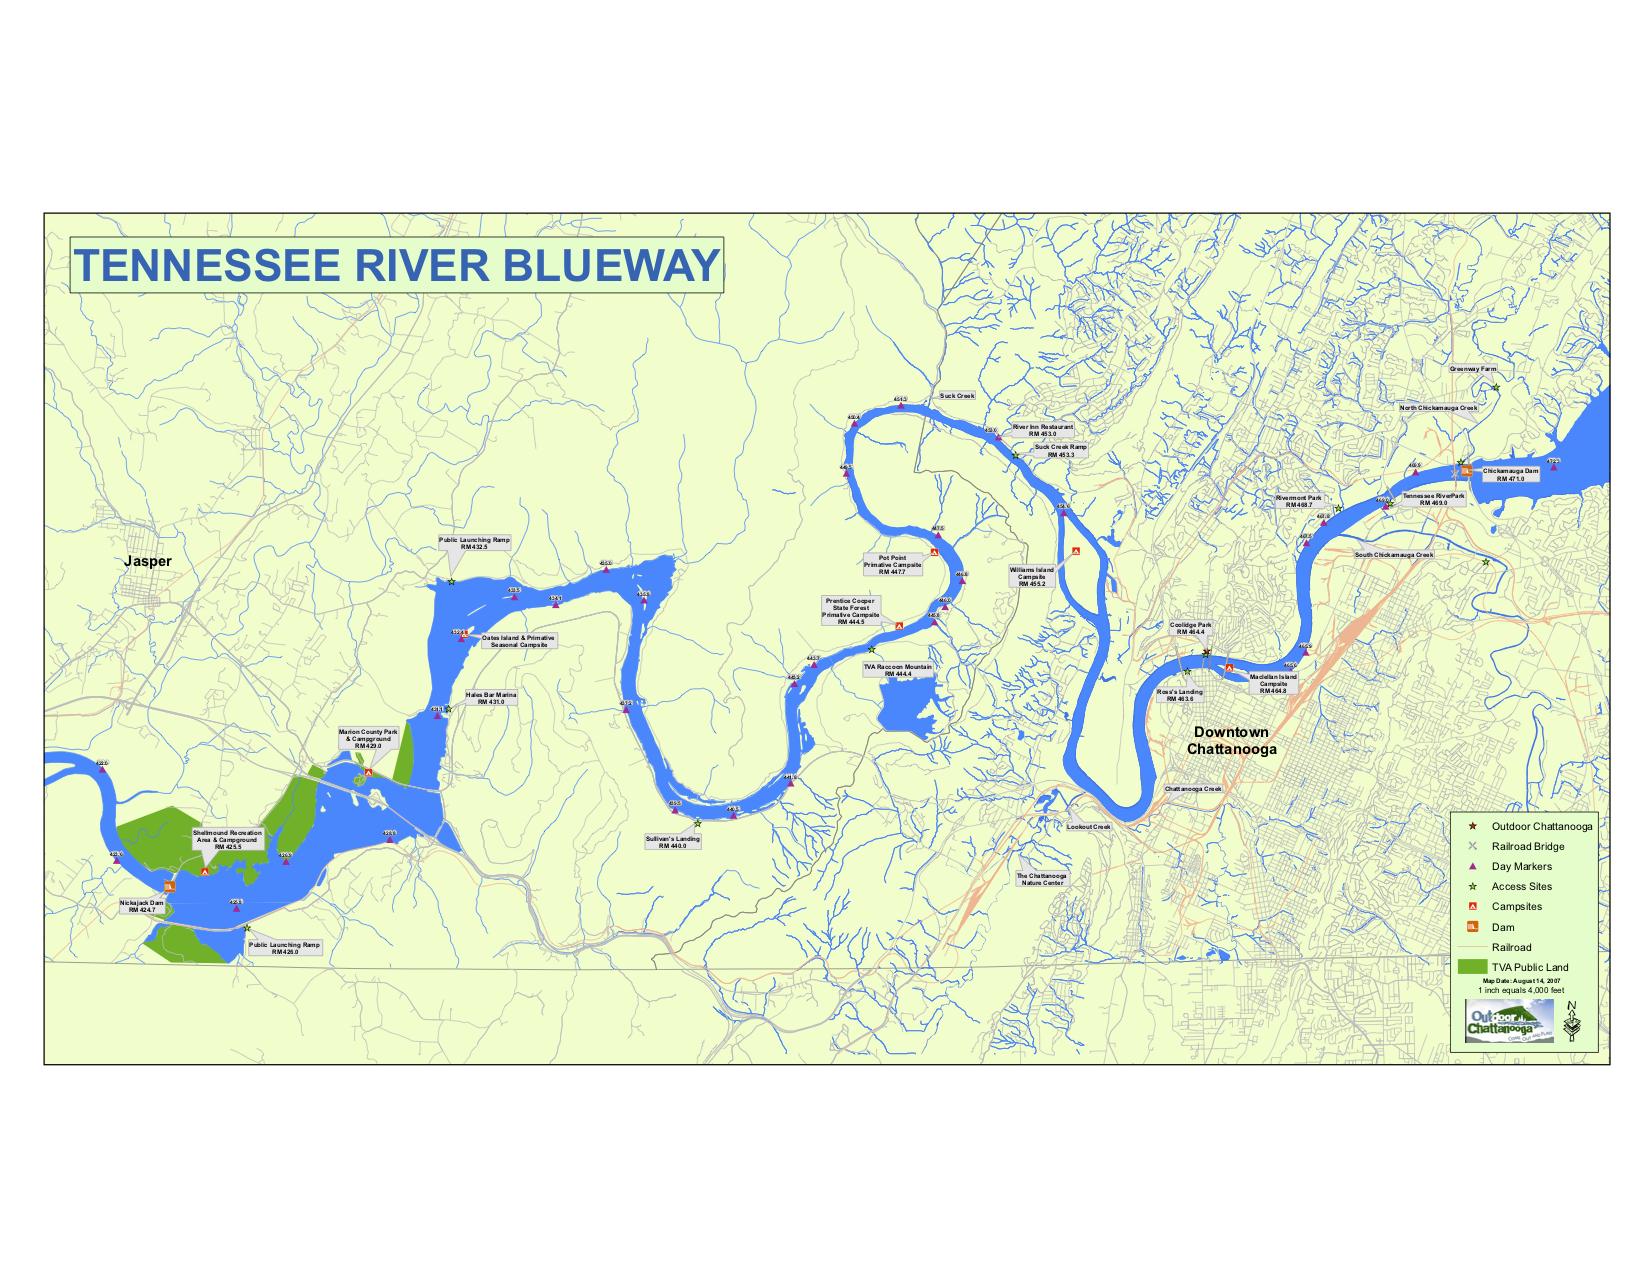 TennesseeBluewayMap JPEG.jpg